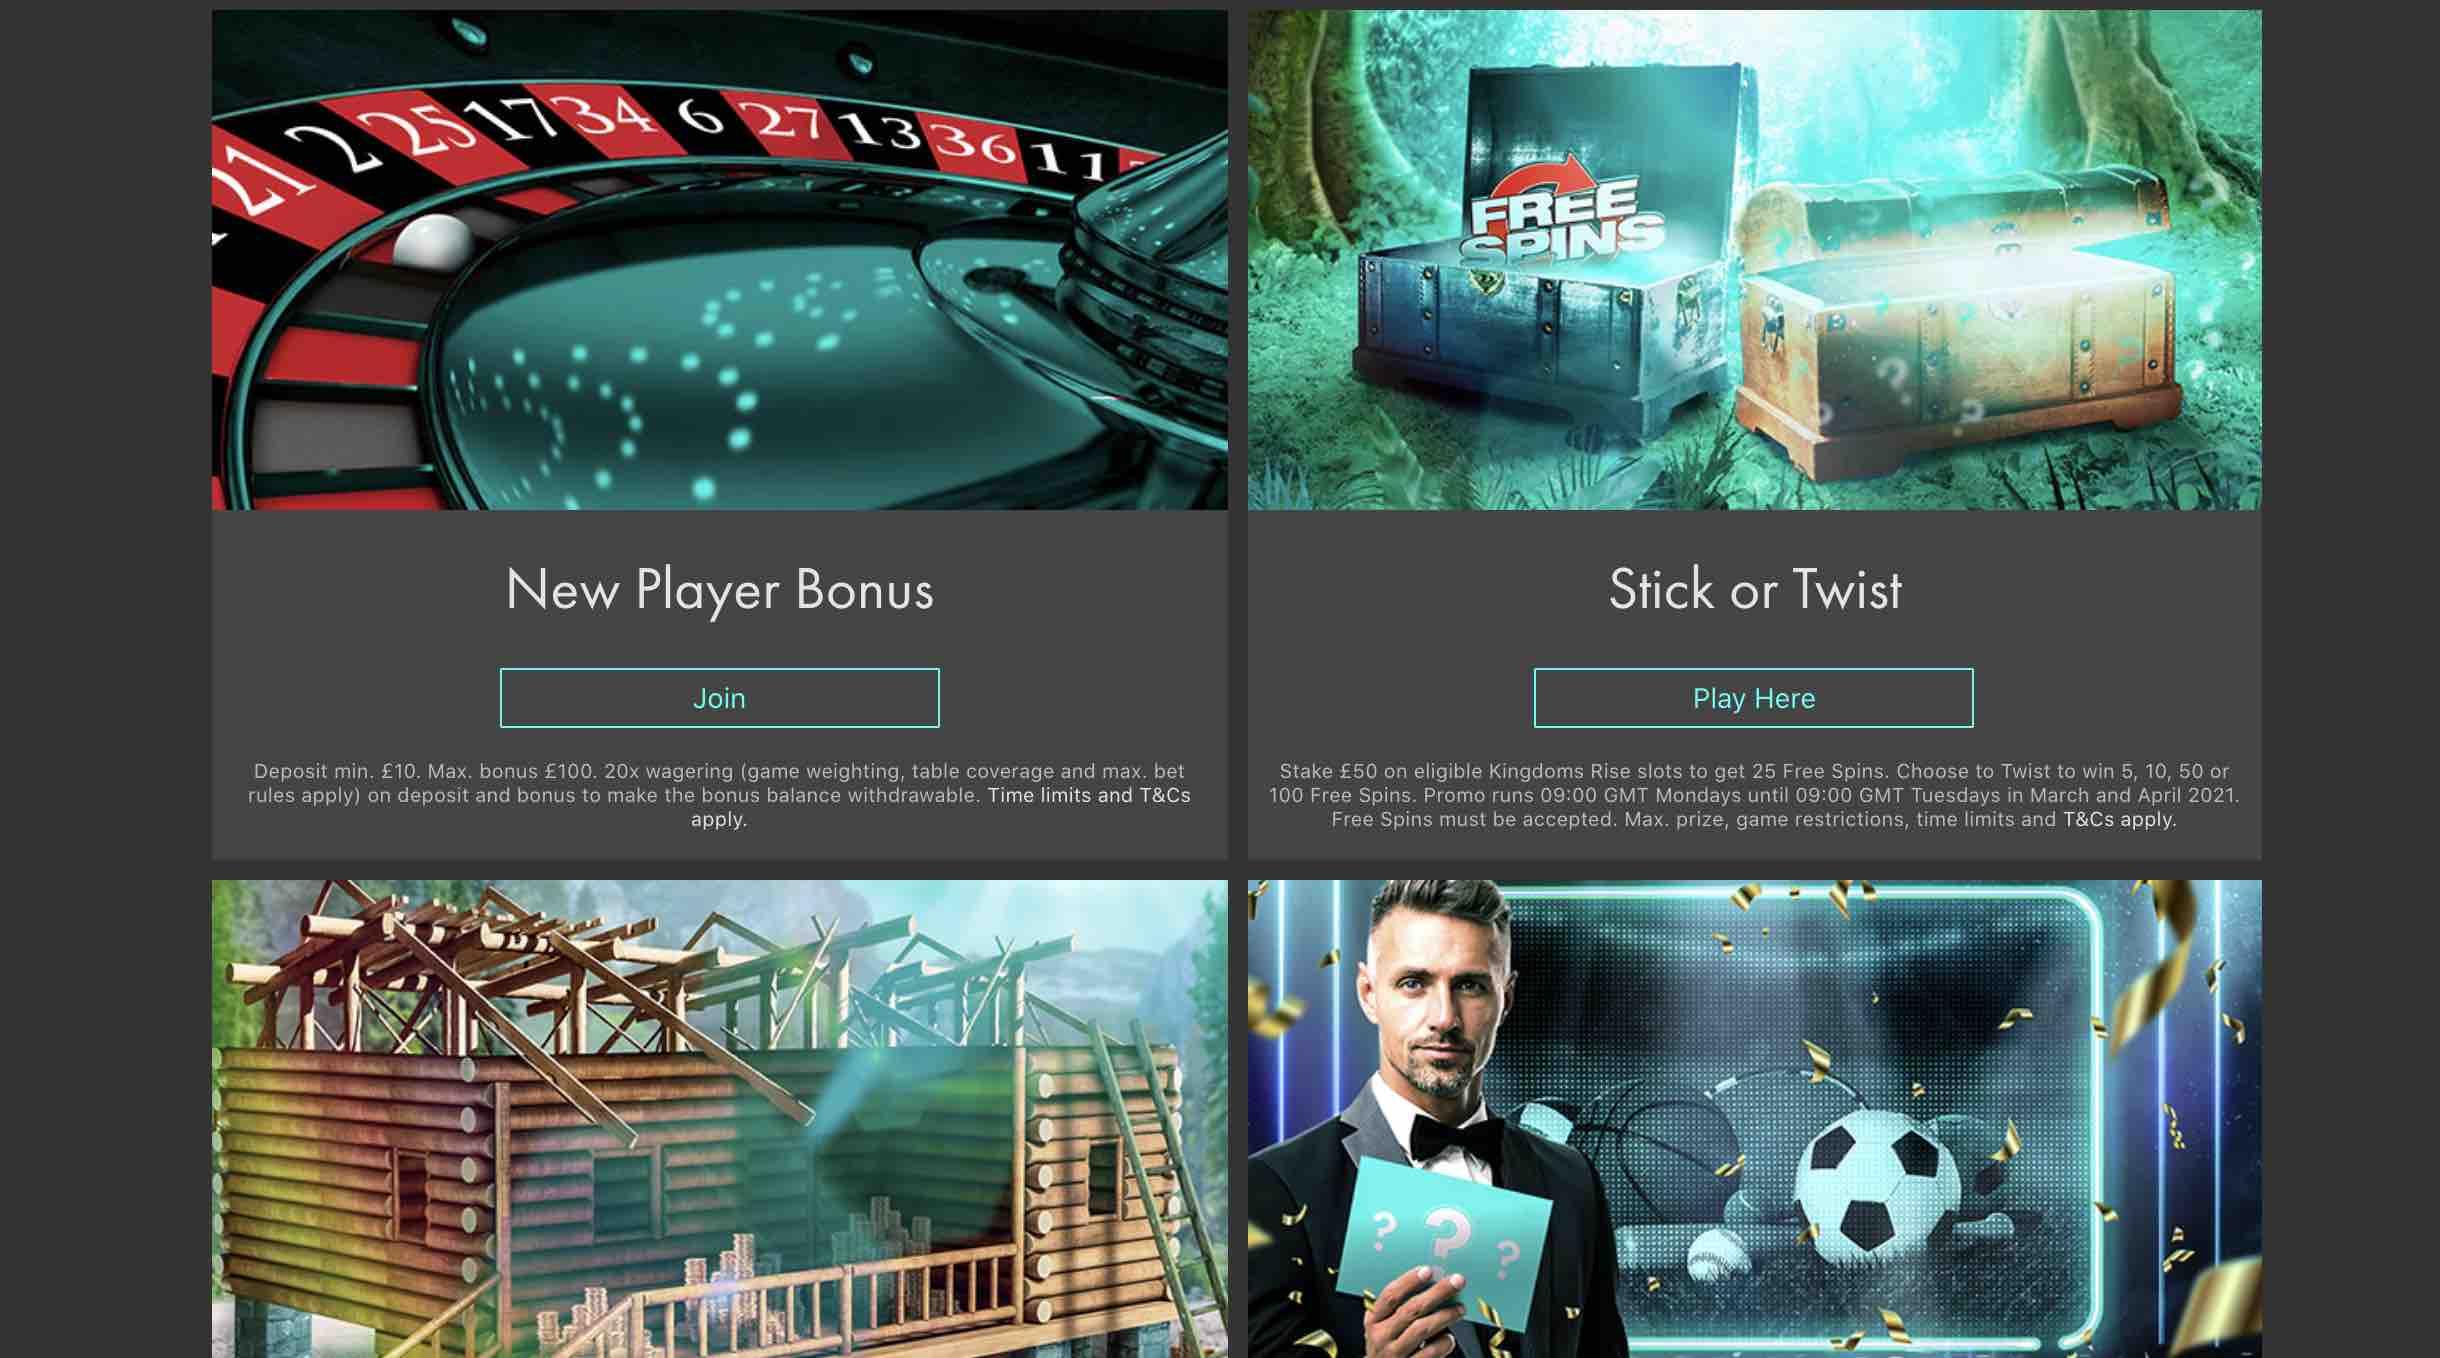 bet365 Casino Games